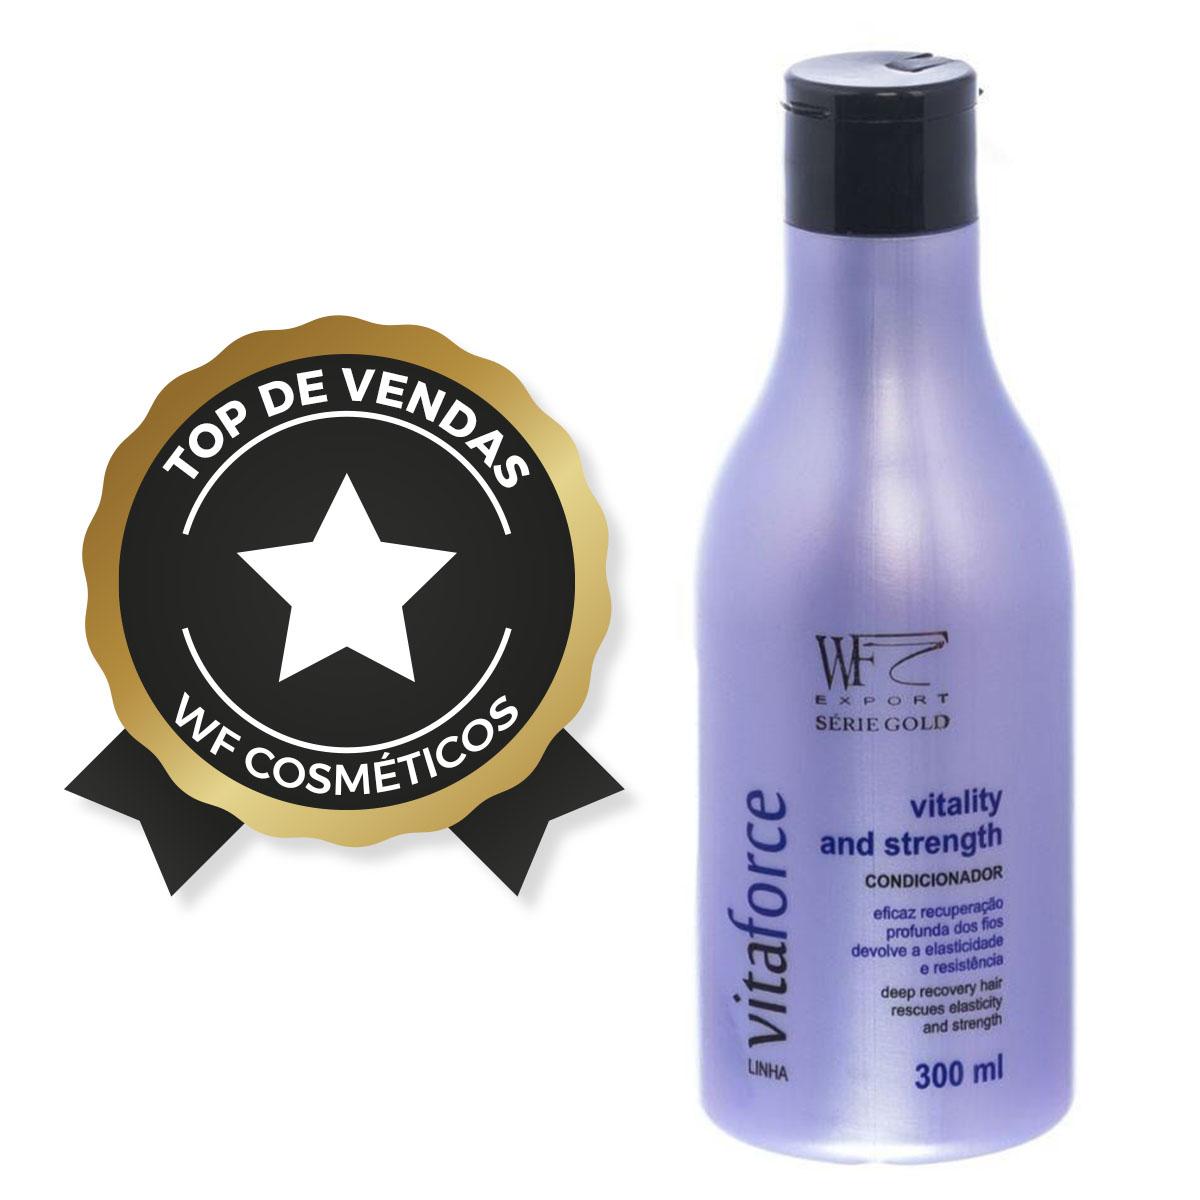 VITAFORCE - CONDICIONADOR VITALITY AND STRENGHT WF COSMETICOS 300ML